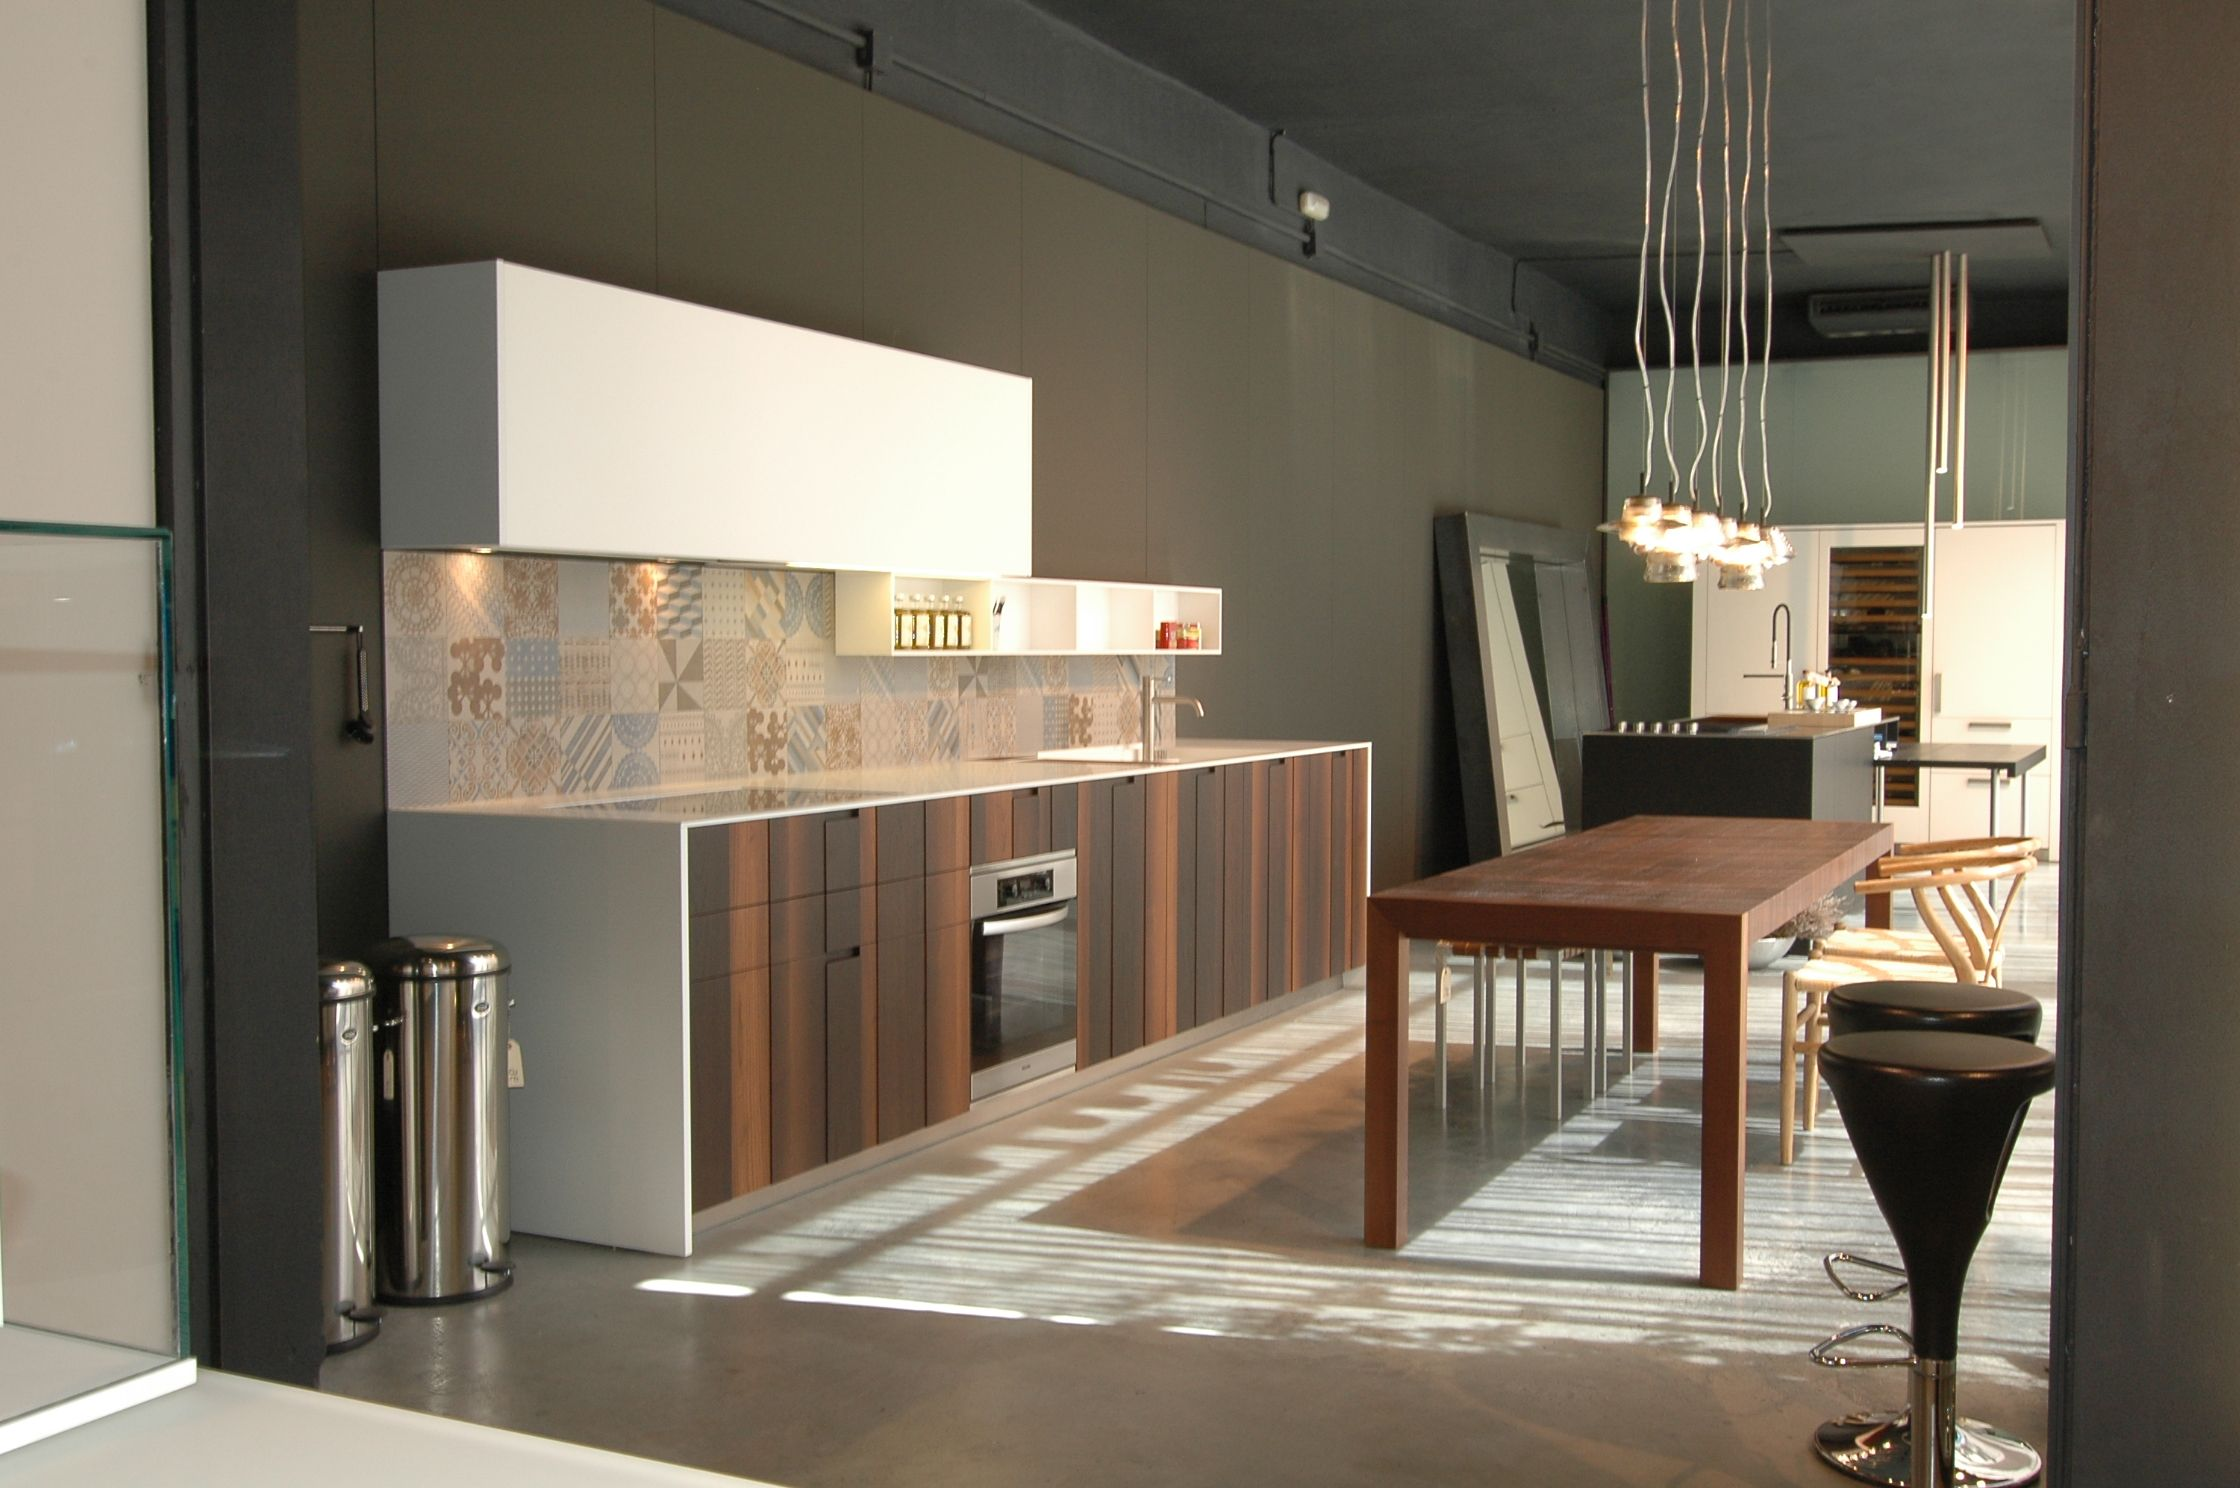 Superb Aprile Wood D Boffi kitchen